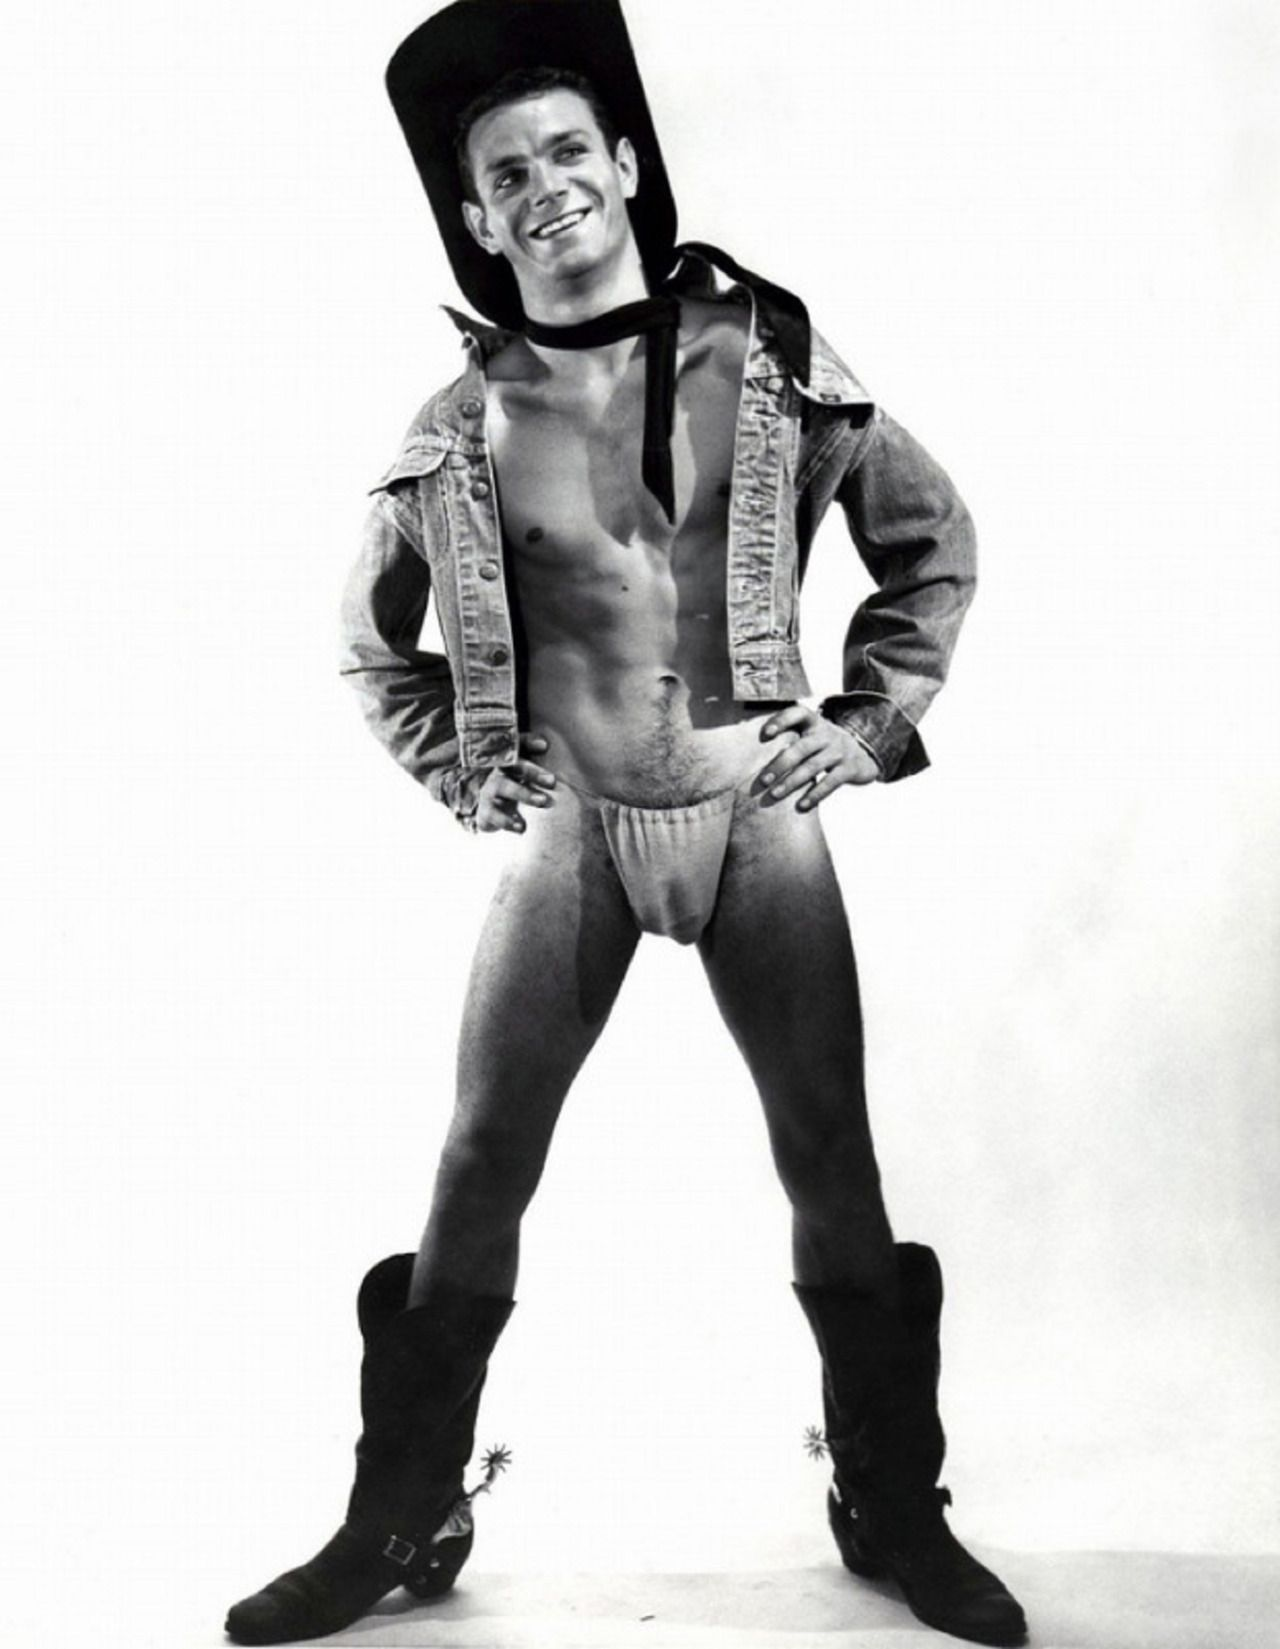 1700s Gay Porn - VINTAGE + NOW: GAY PORN - Peter Andrews - 1950s gay porn by John Palatinus